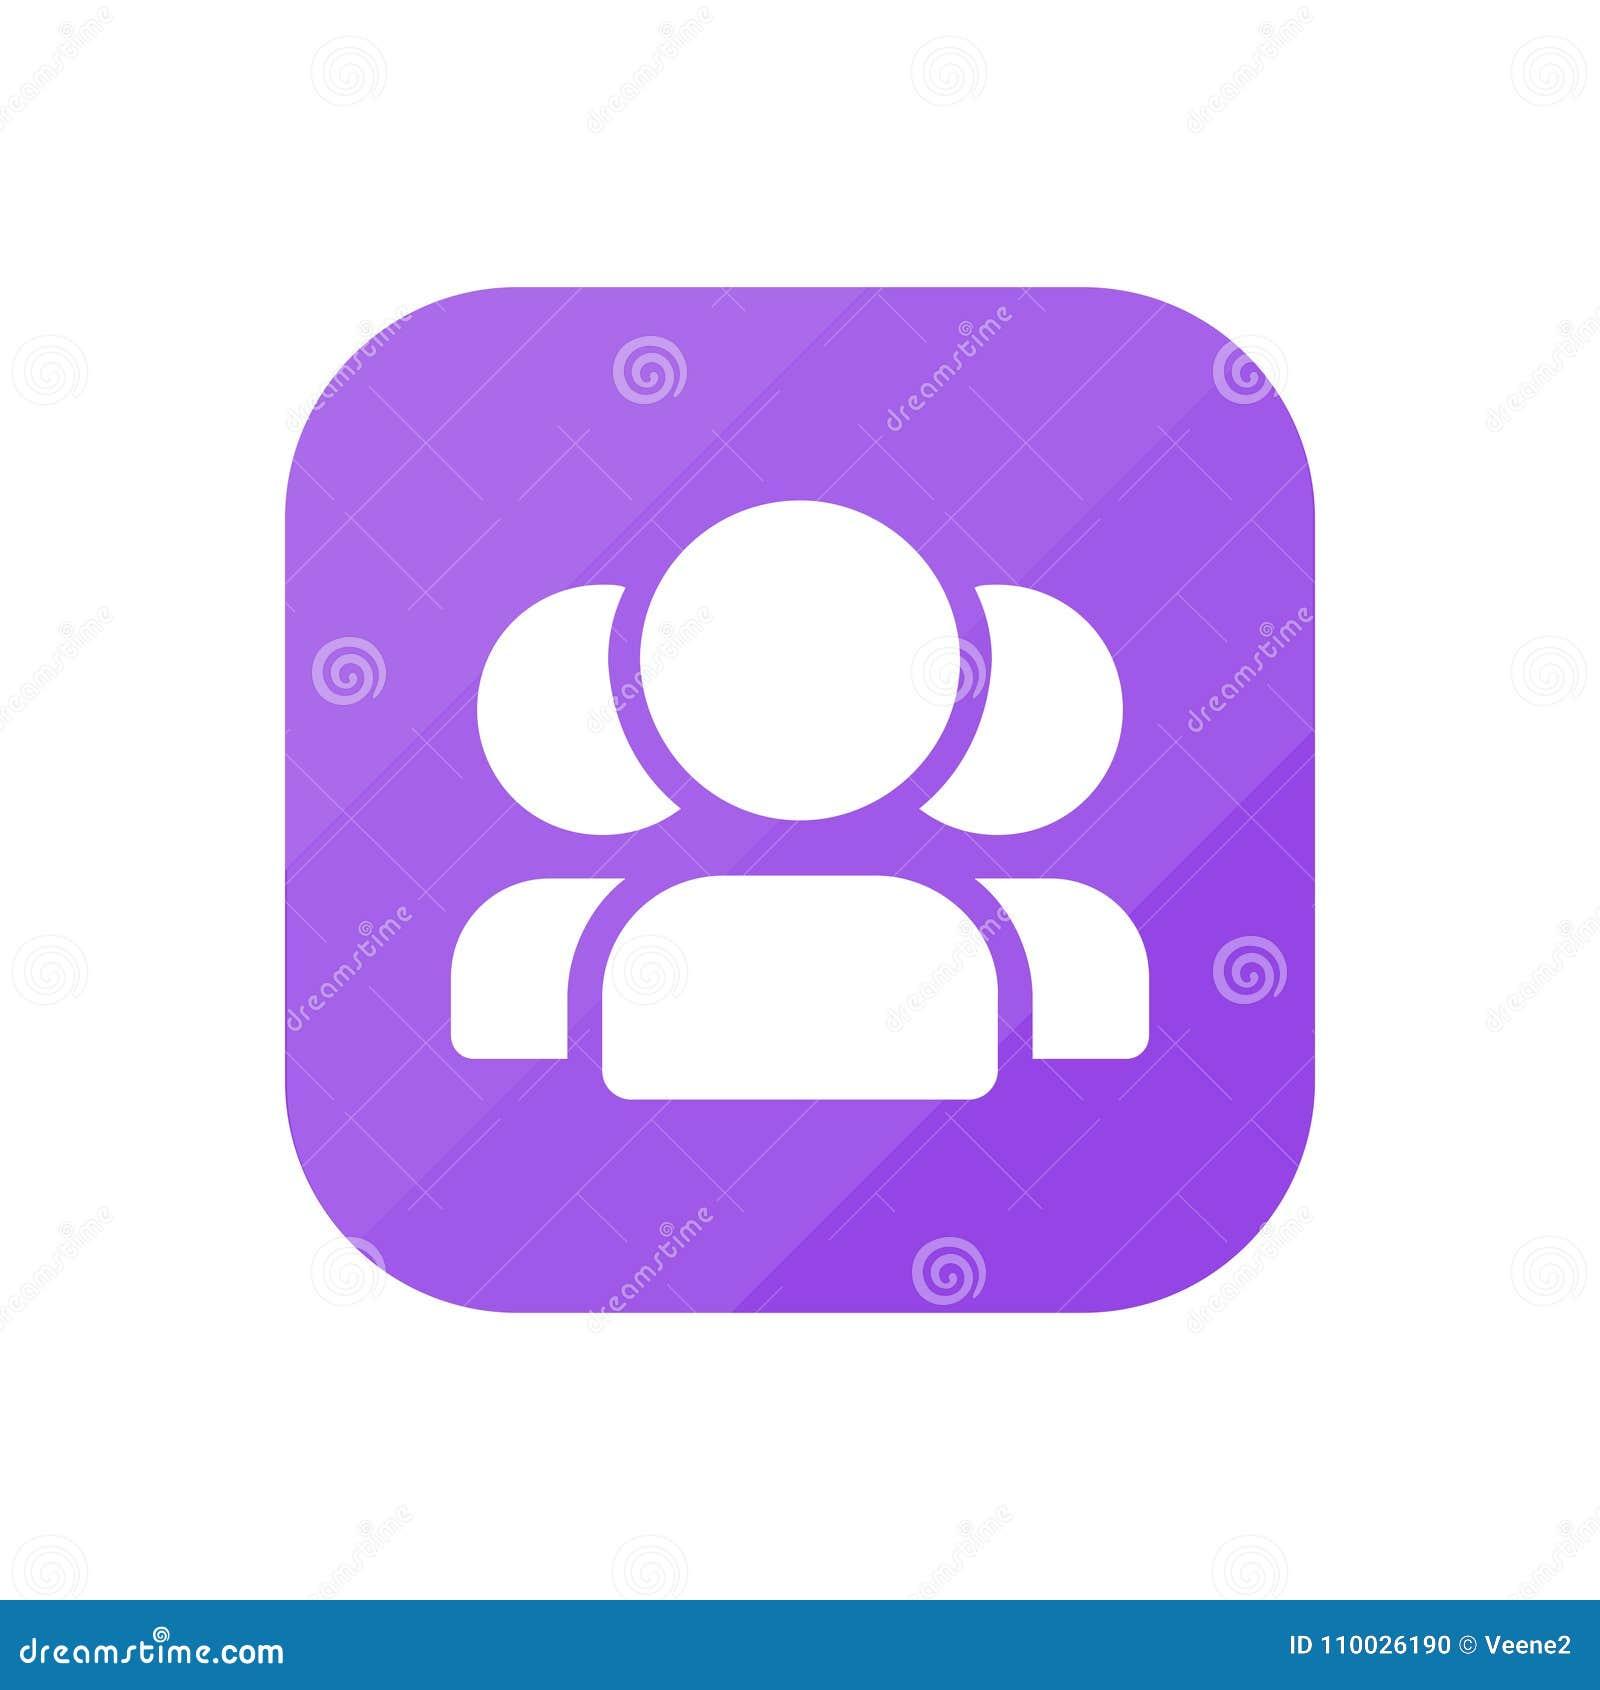 Team - App Pictogram